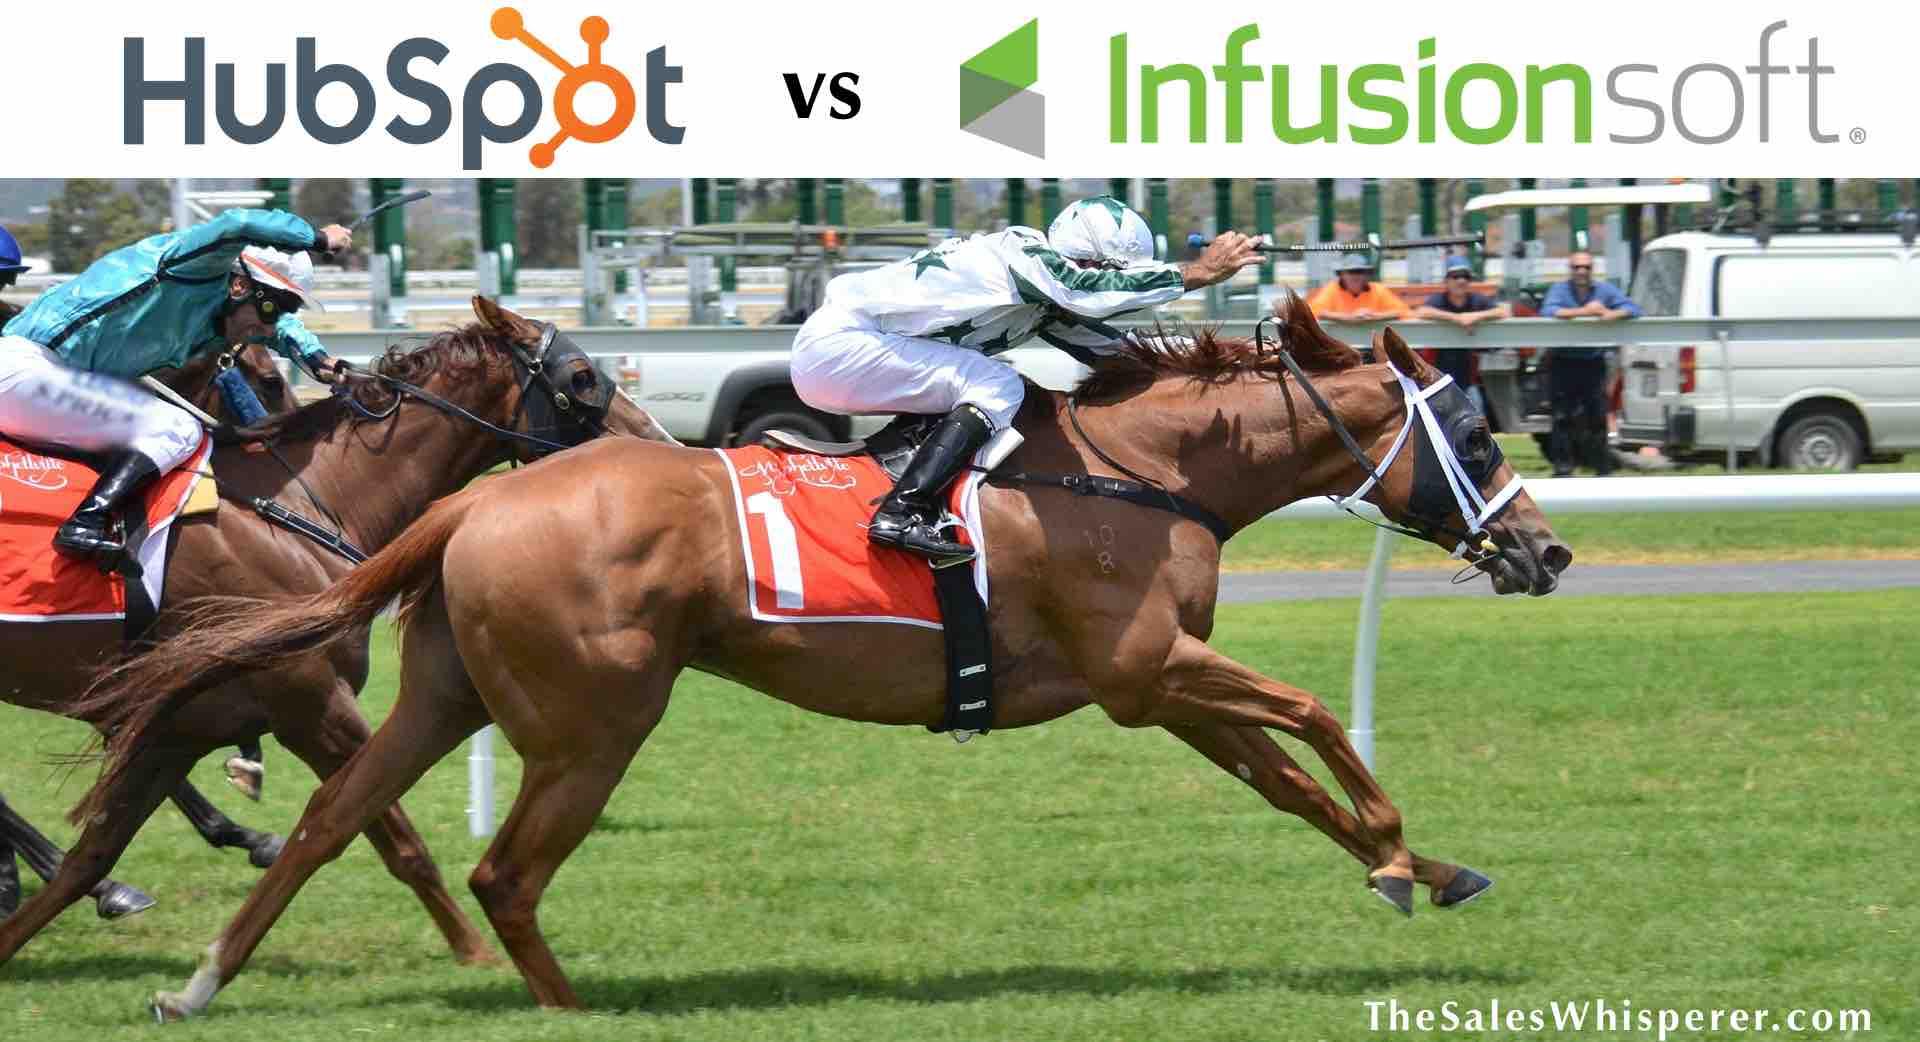 HubSpot vs Infusionsoft Race.jpg